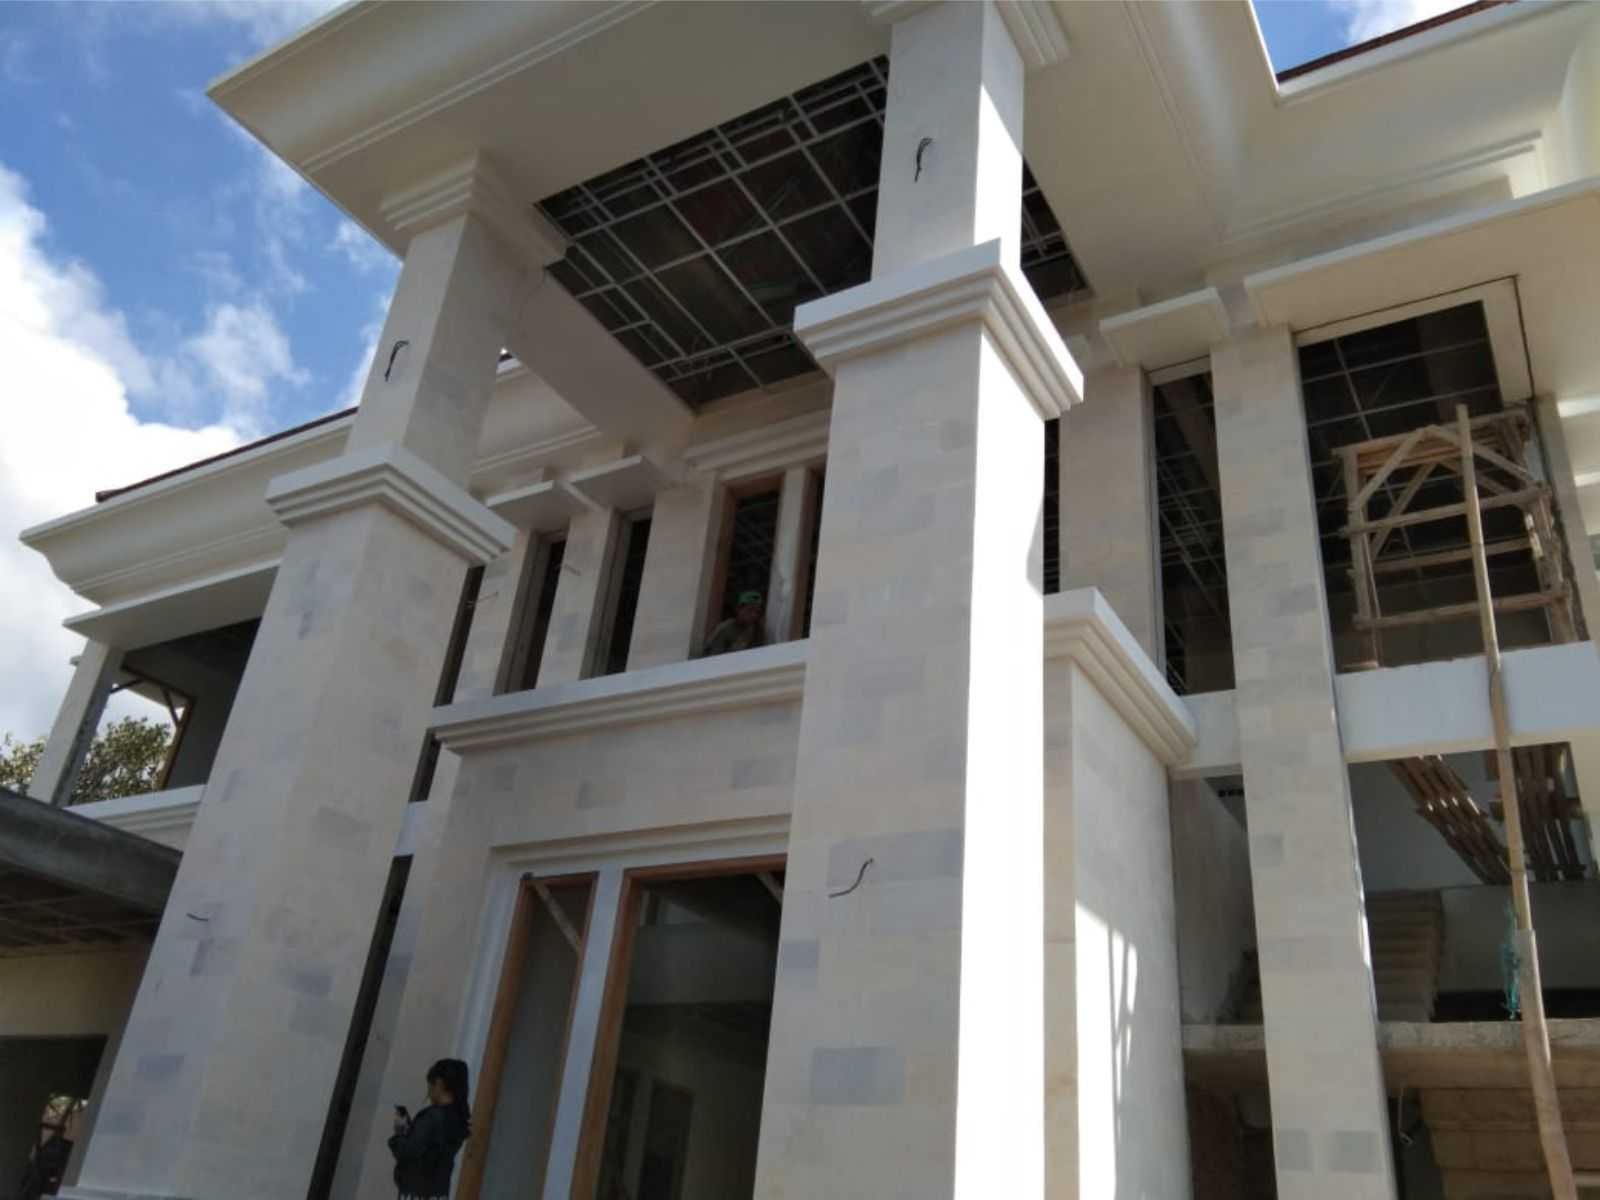 Emporio Architect In Progress Villa Bali Tropis 216  @ Denpasar Kota Denpasar, Bali, Indonesia Kota Denpasar, Bali, Indonesia Emporio-Architect-Progress-Villa-Bali-Tropis-216-Denpasar  75653